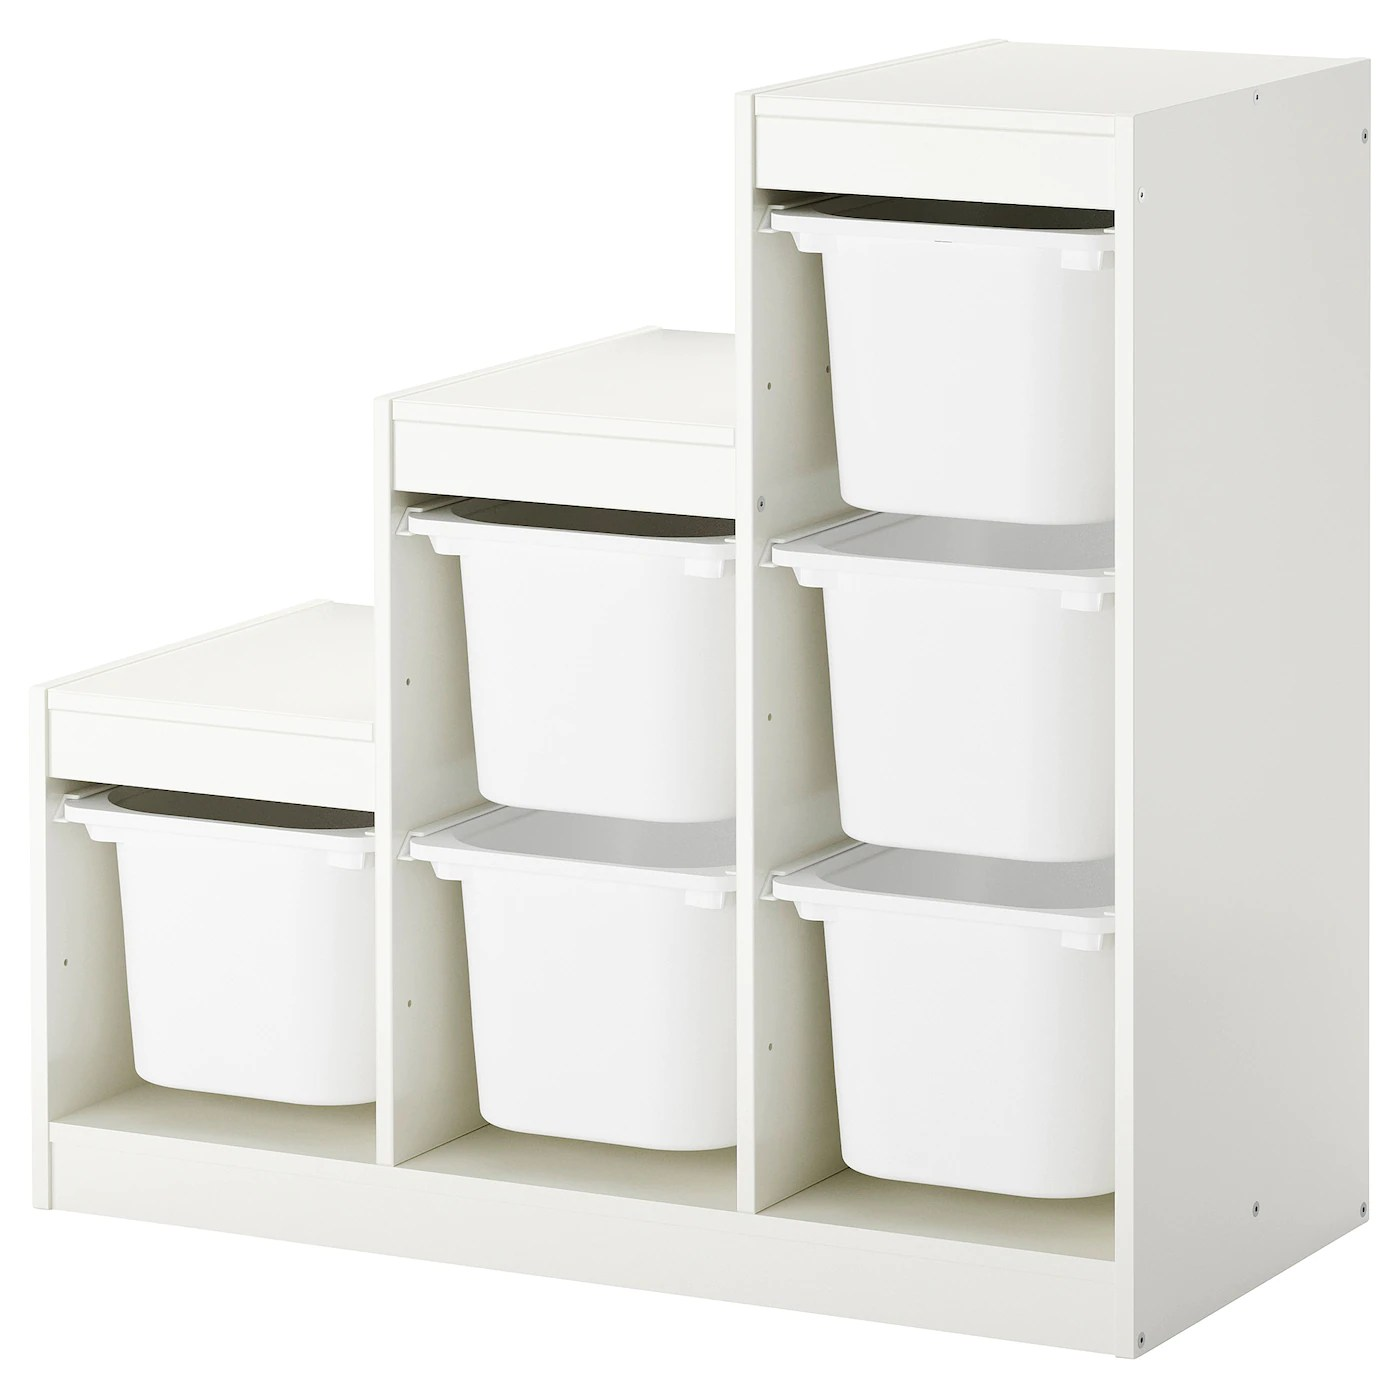 Trofast Combi Rangement Boites Blanc 99x44x94 Cm Ikea